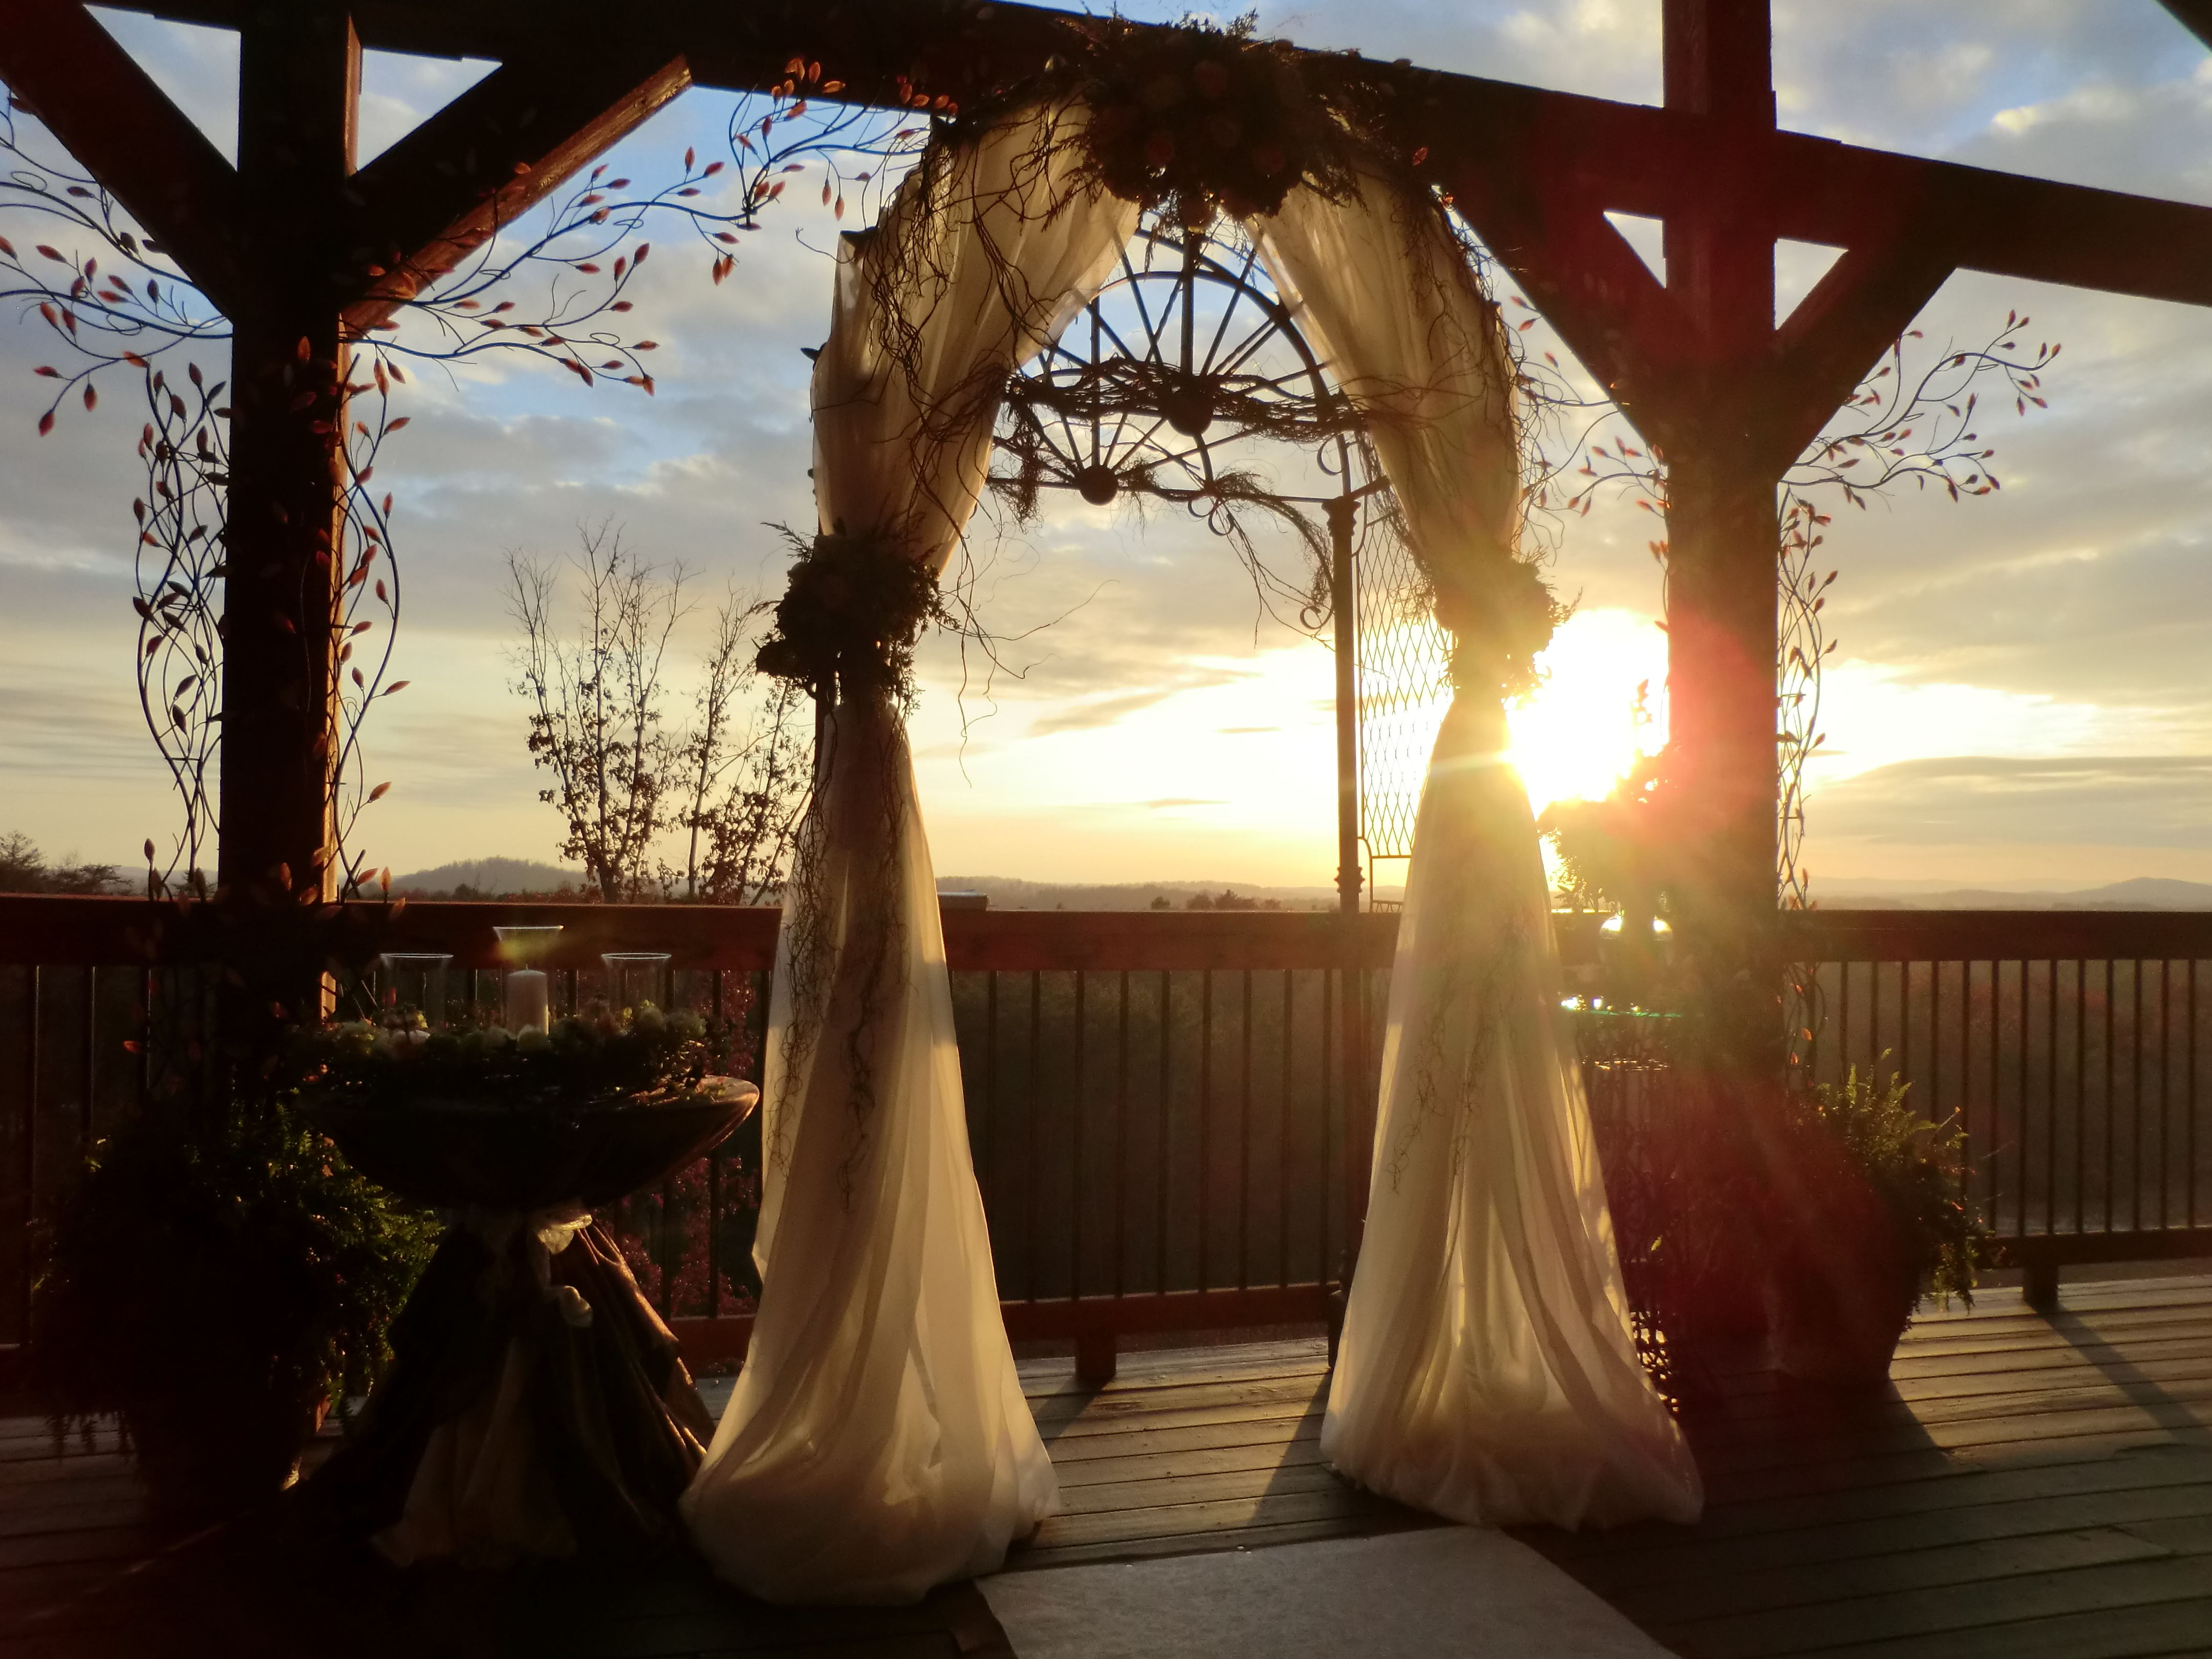 My cousin's wedding venueWolf Mountain Vineyard in